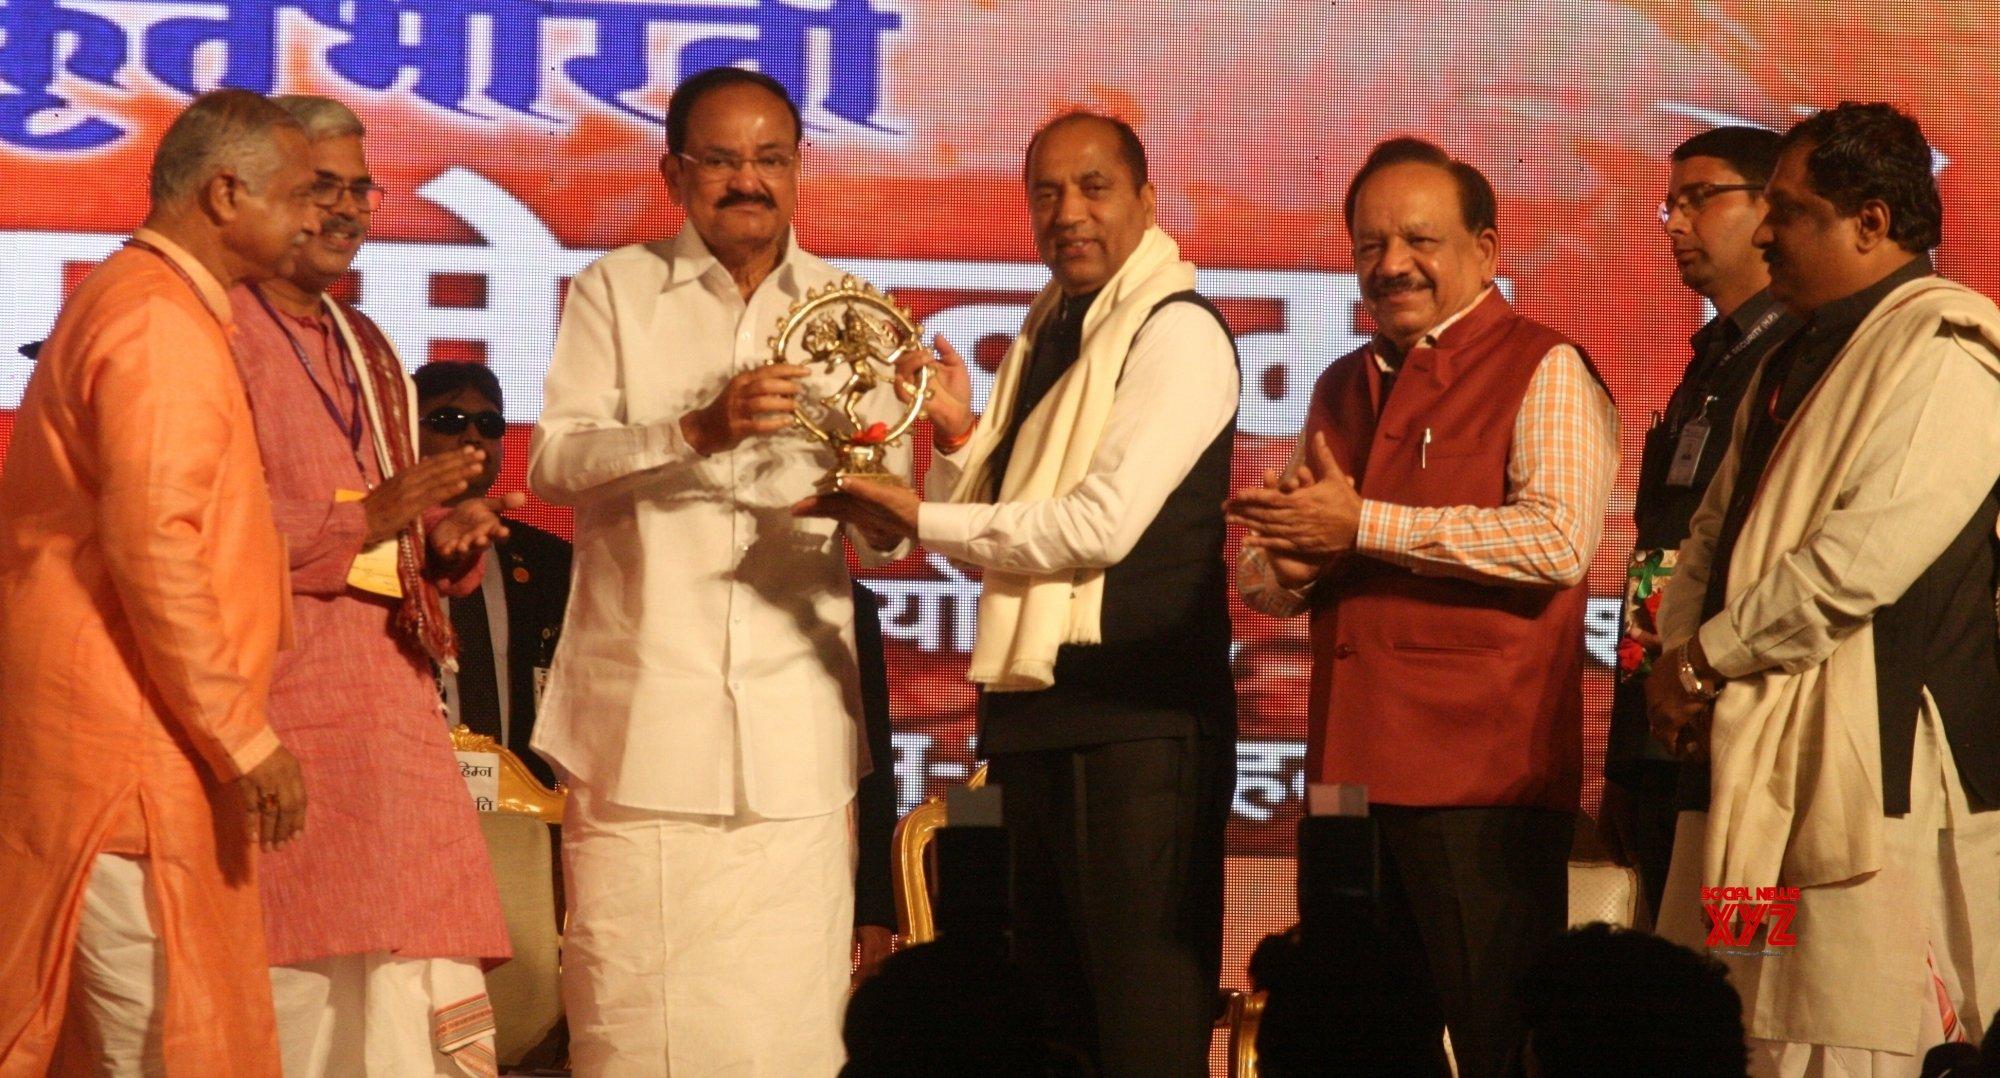 New Delhi: World conference - Venkaiah Naidu #Gallery